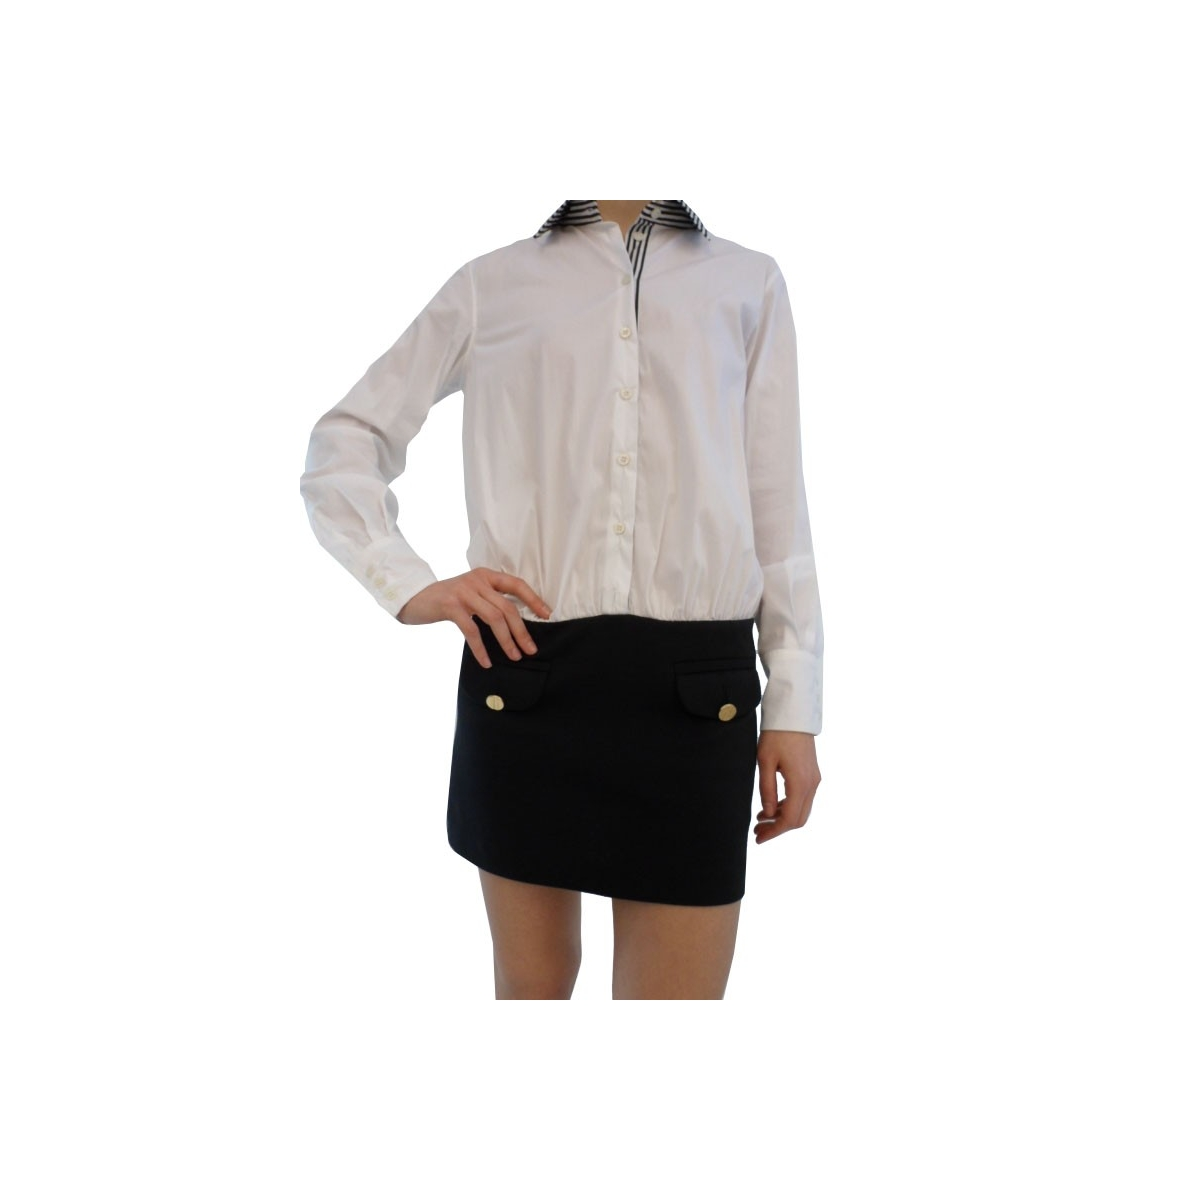 Frankie Morello abito dress TM528 5600IT -60%